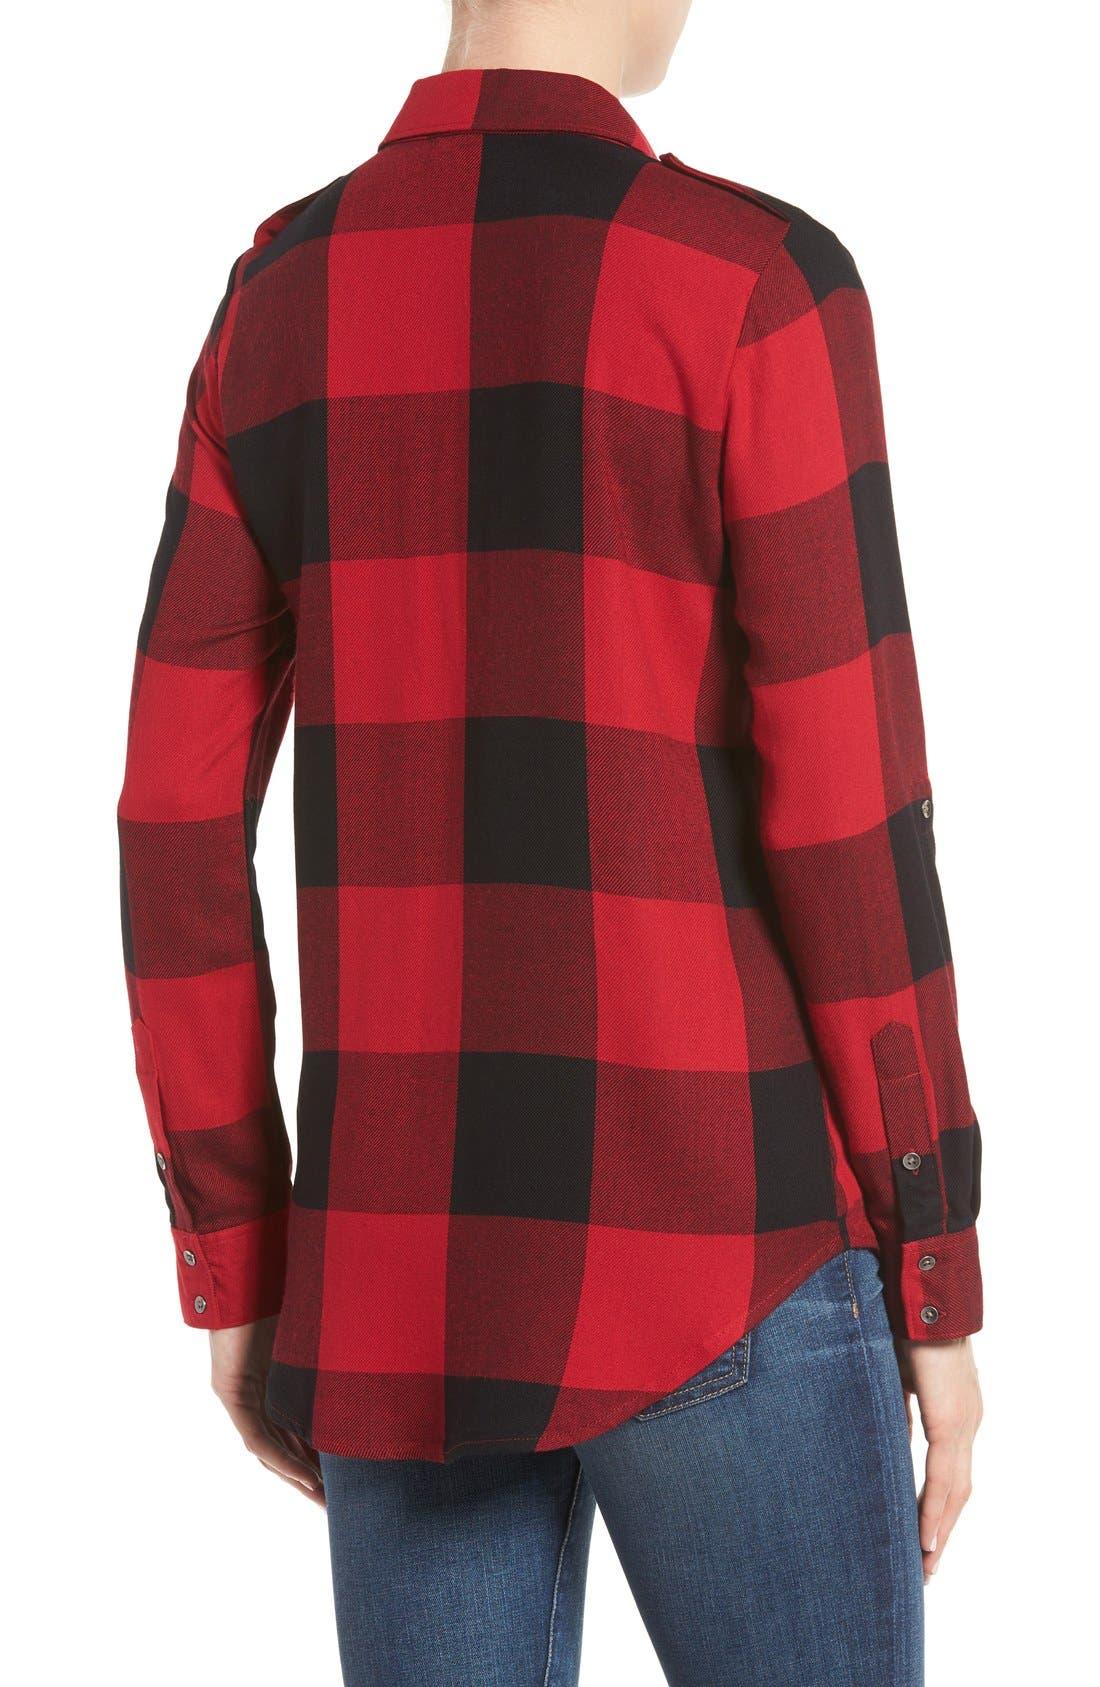 Roll Sleeve Plaid Shirt,                             Alternate thumbnail 4, color,                             600